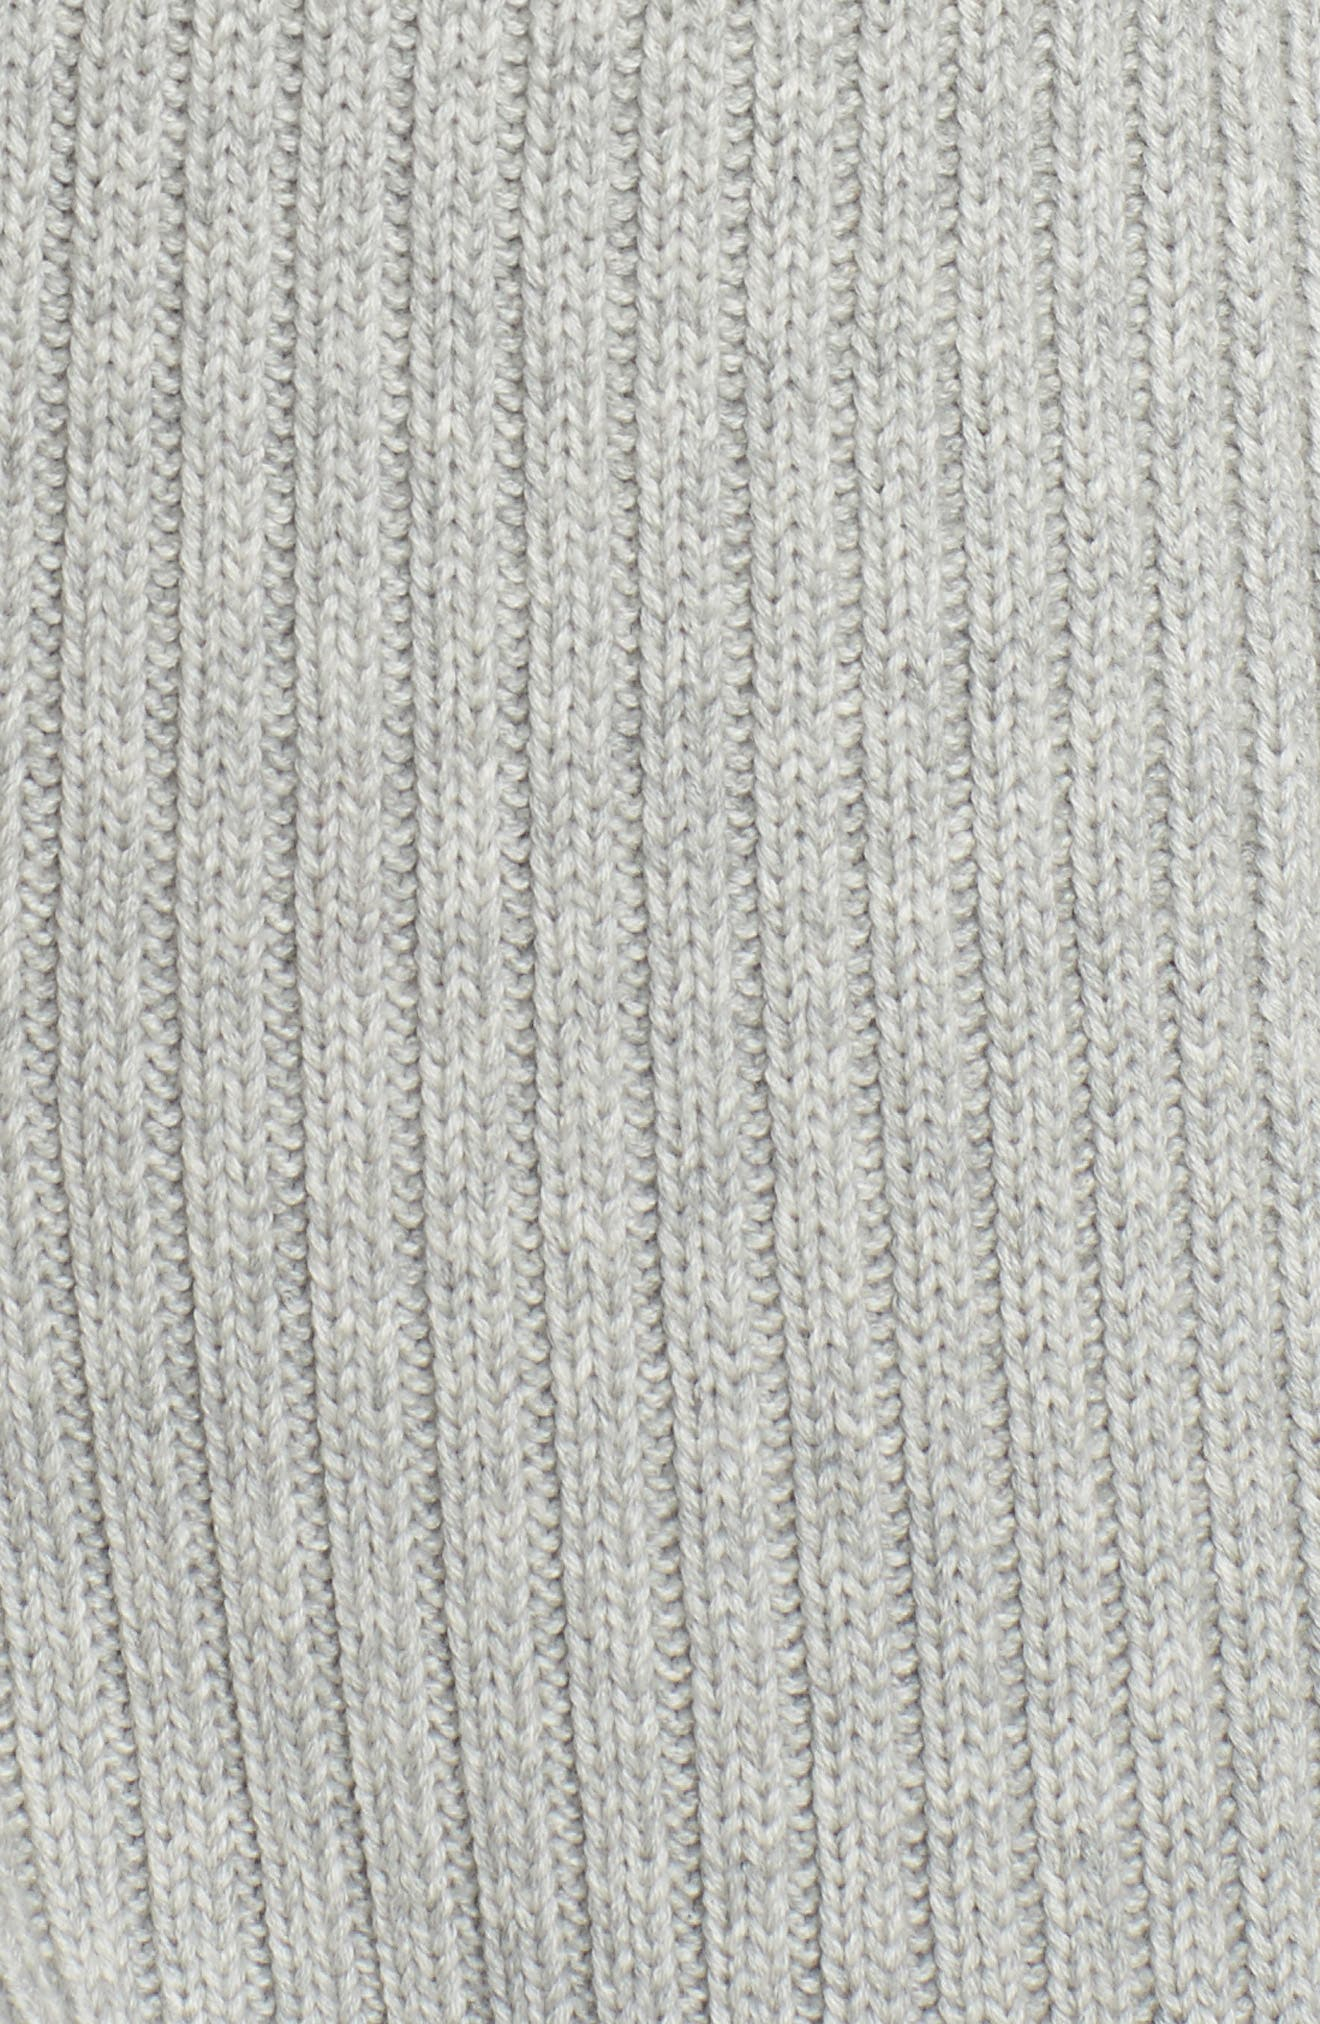 Ila Sweater,                             Alternate thumbnail 5, color,                             304